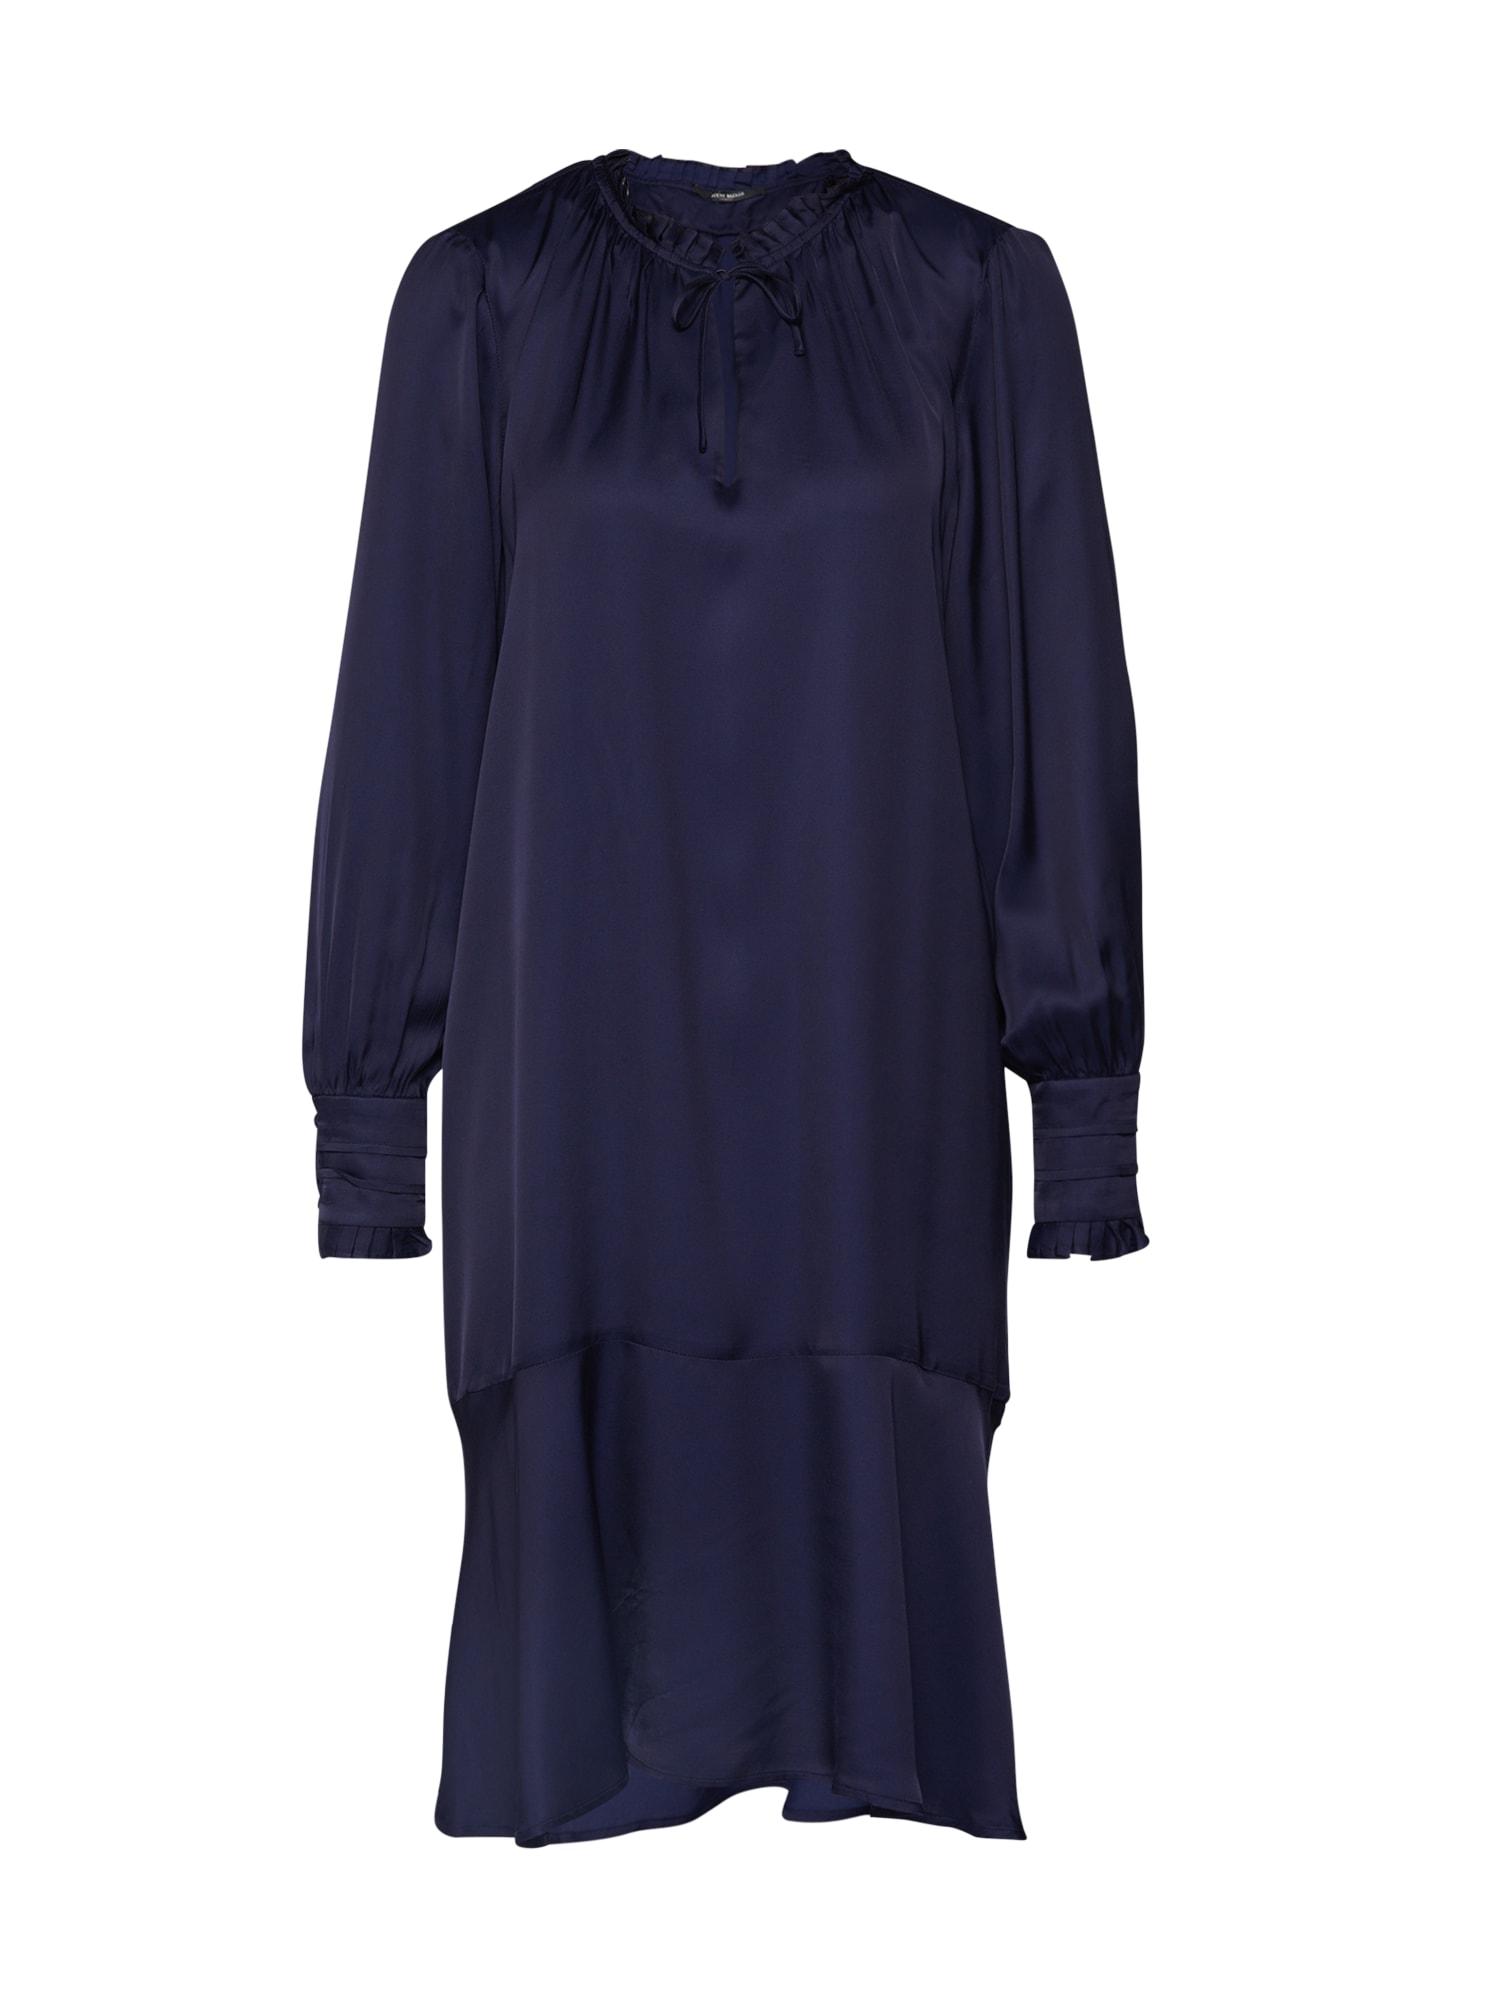 BRUUNS BAZAAR Košilové šaty 'Baume Este'  námořnická modř